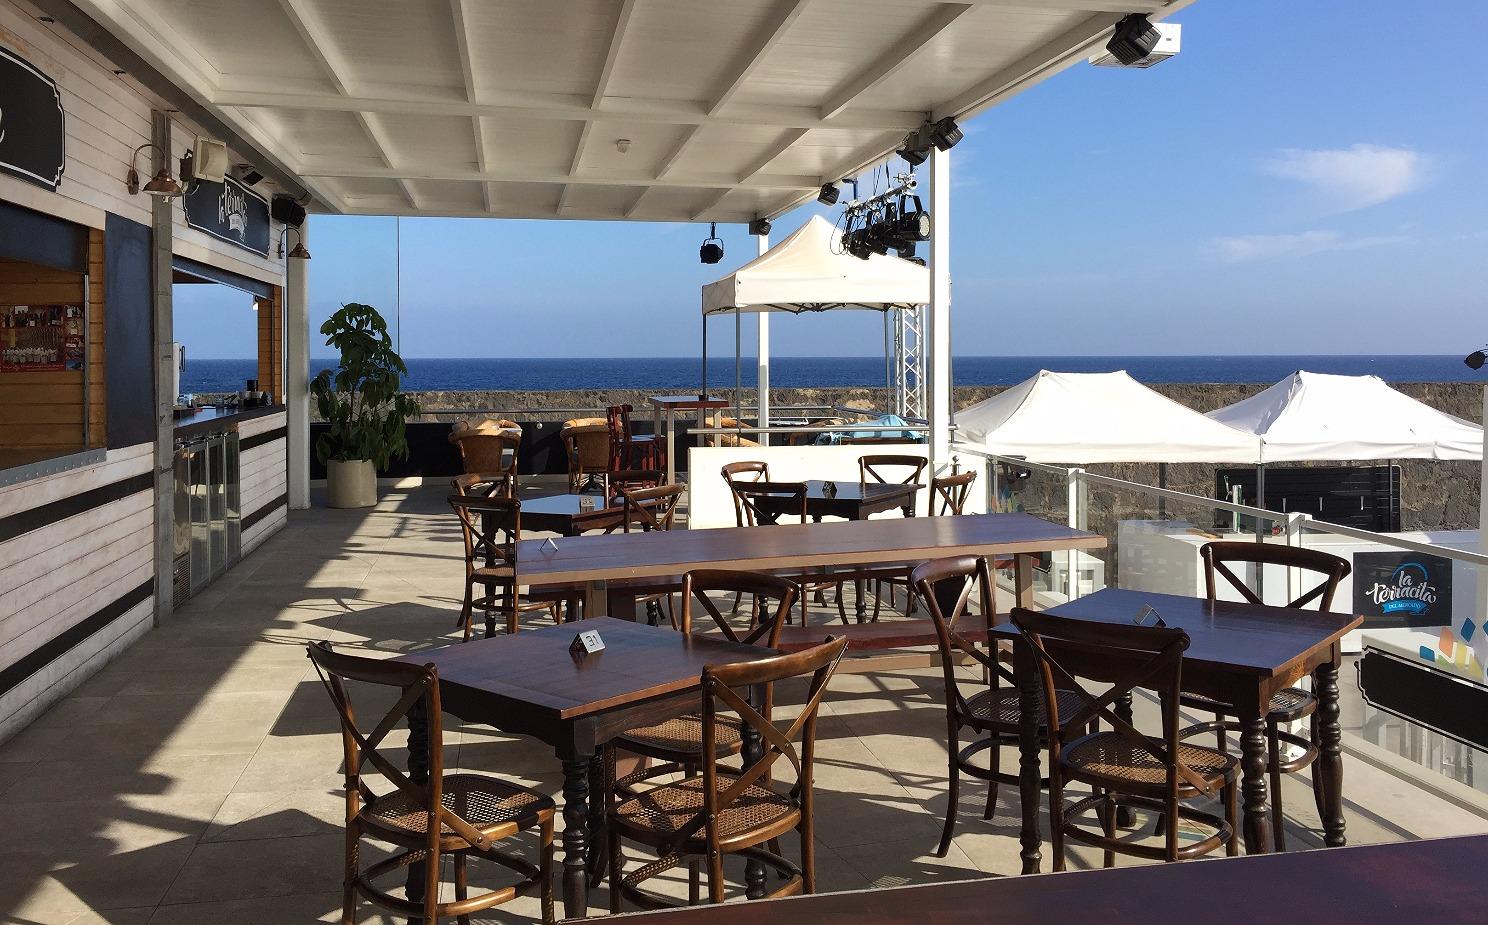 Marina Lanzarote Restaurants